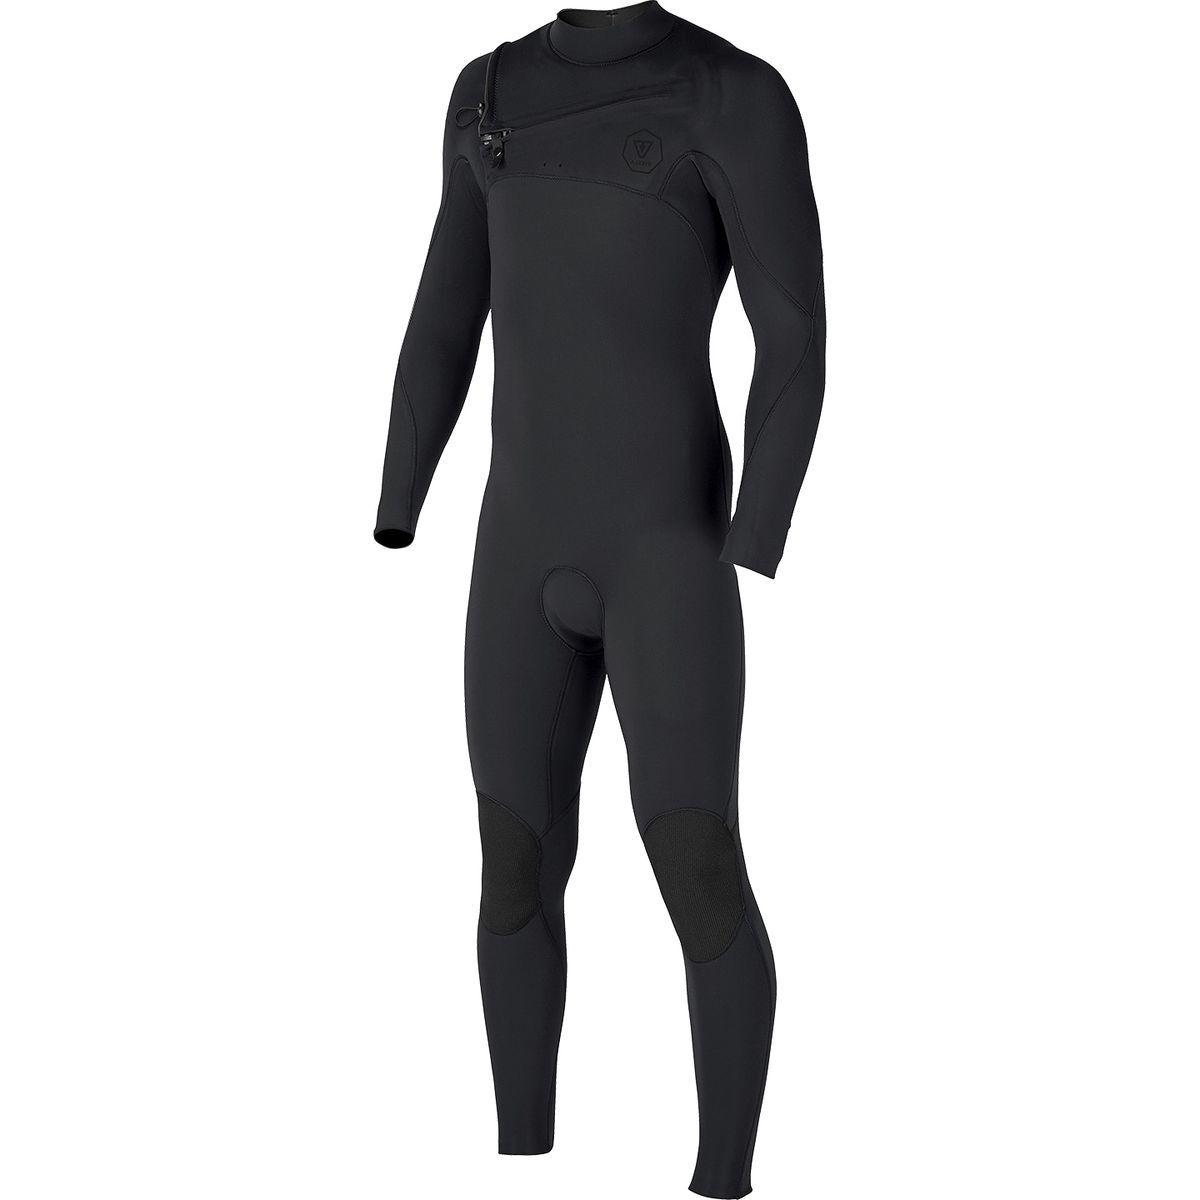 Vissla 7 Seas Tripper Front-Zip Long-Sleeve Full Wetsuit - Men's